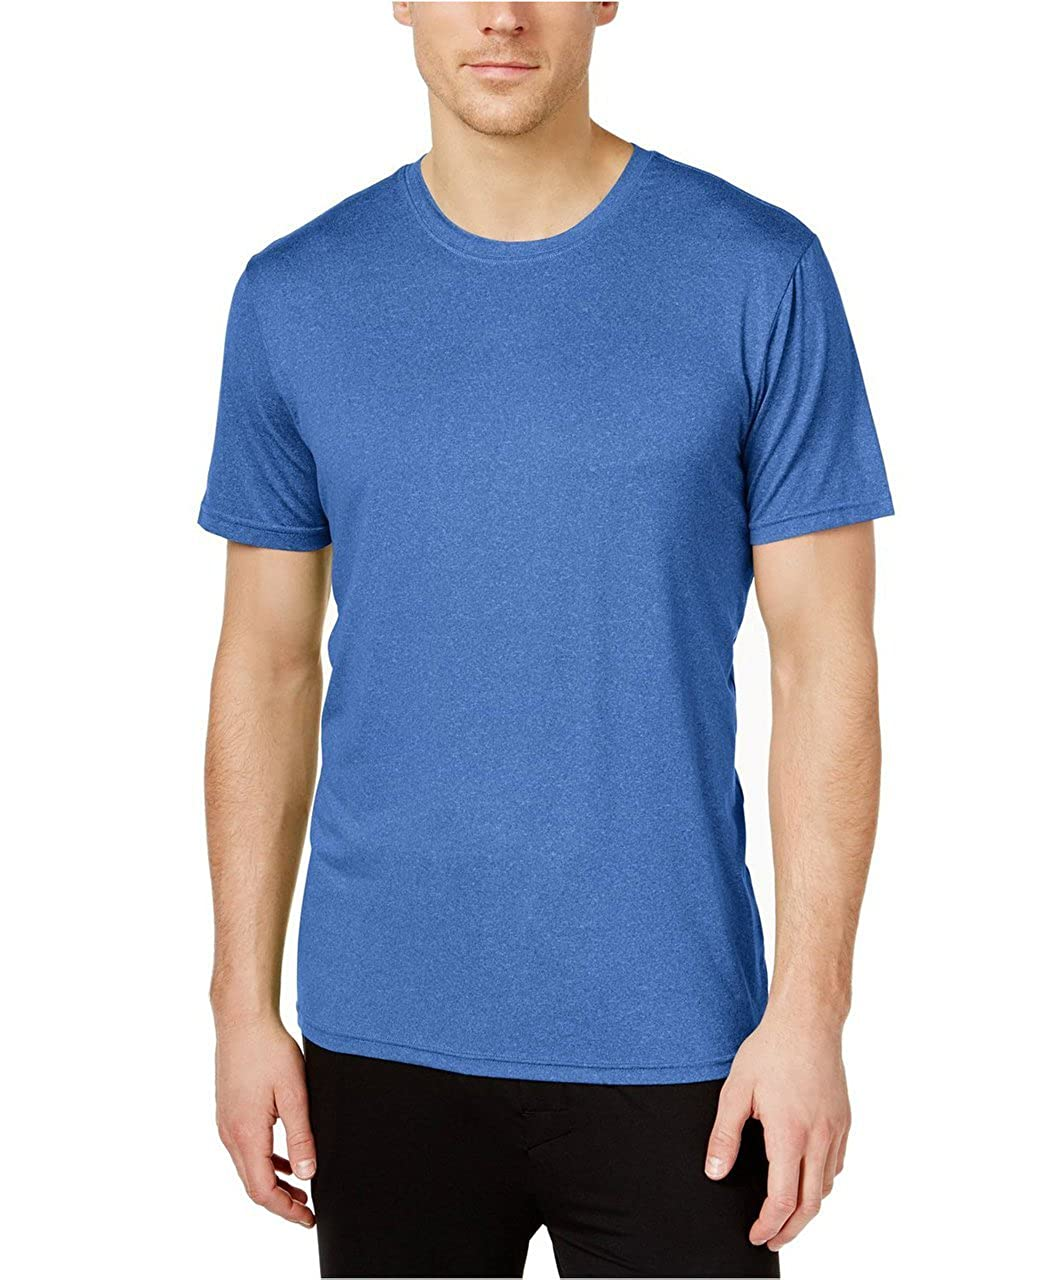 Amazon.com: 32 Degrees Weatherproof® Mens Cool Tee Short Sleeve, Crew Neck, Quick Dry, Anti-odor: Clothing